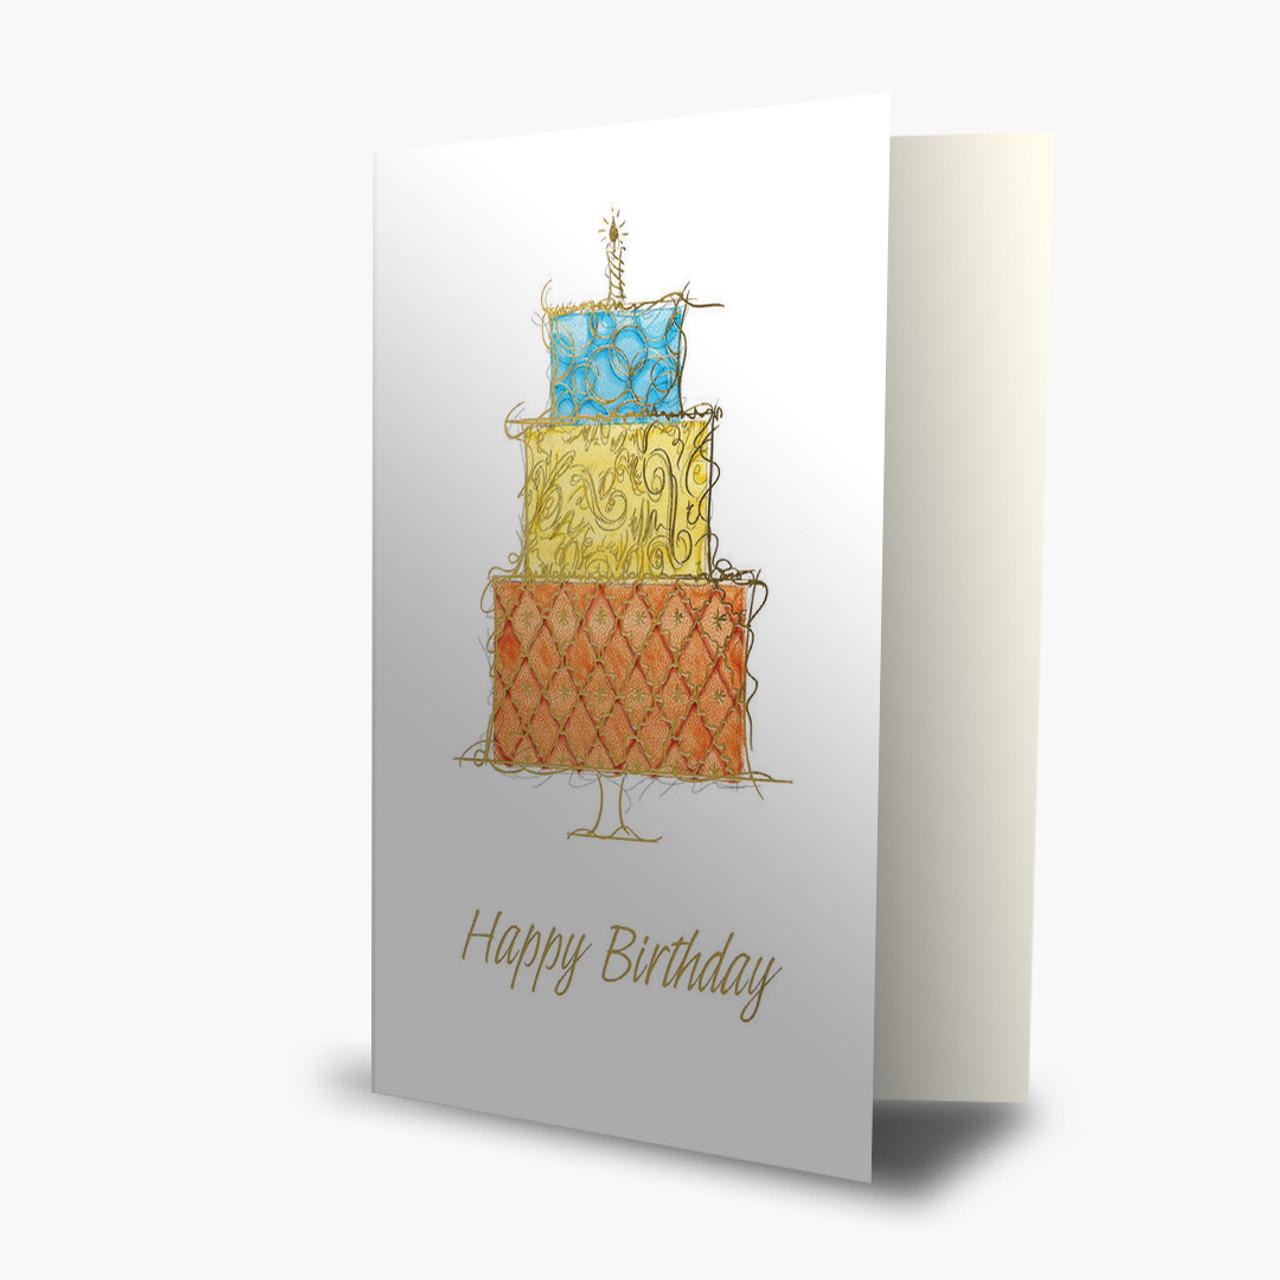 Ornate Cake Birthday Card